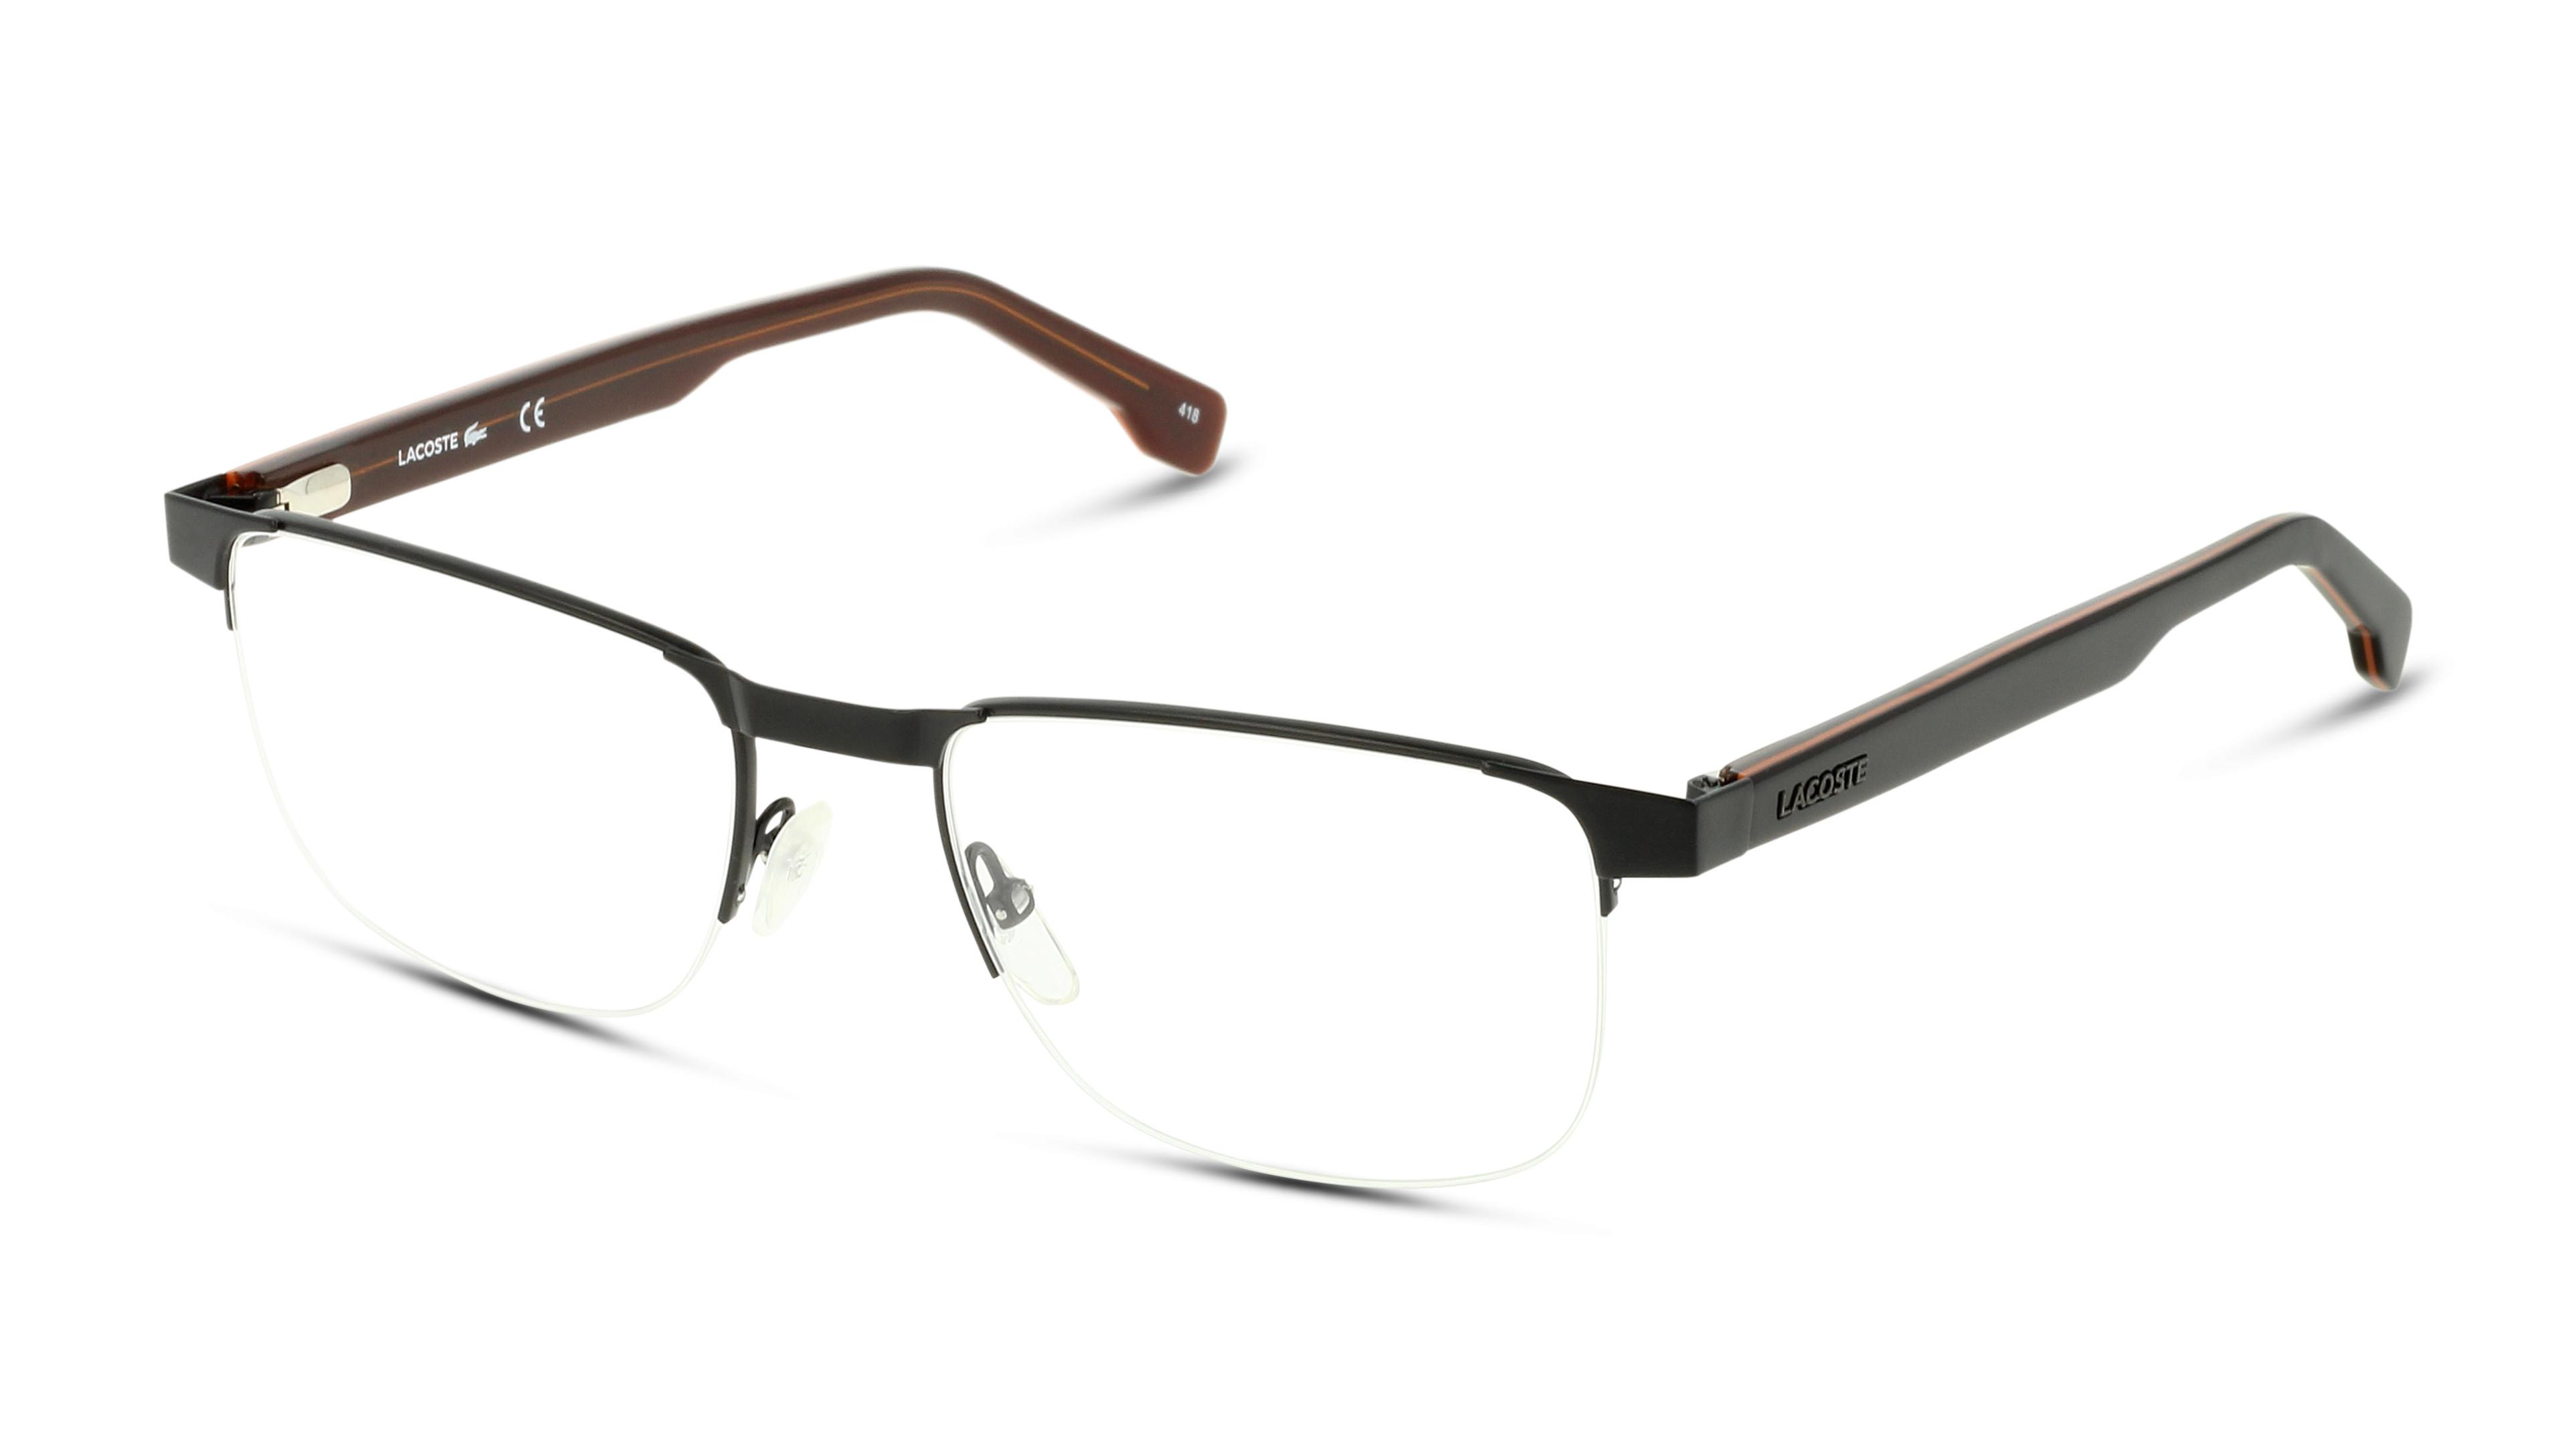 886895402798-angle-03-lacoste-l2248-eyewear-black